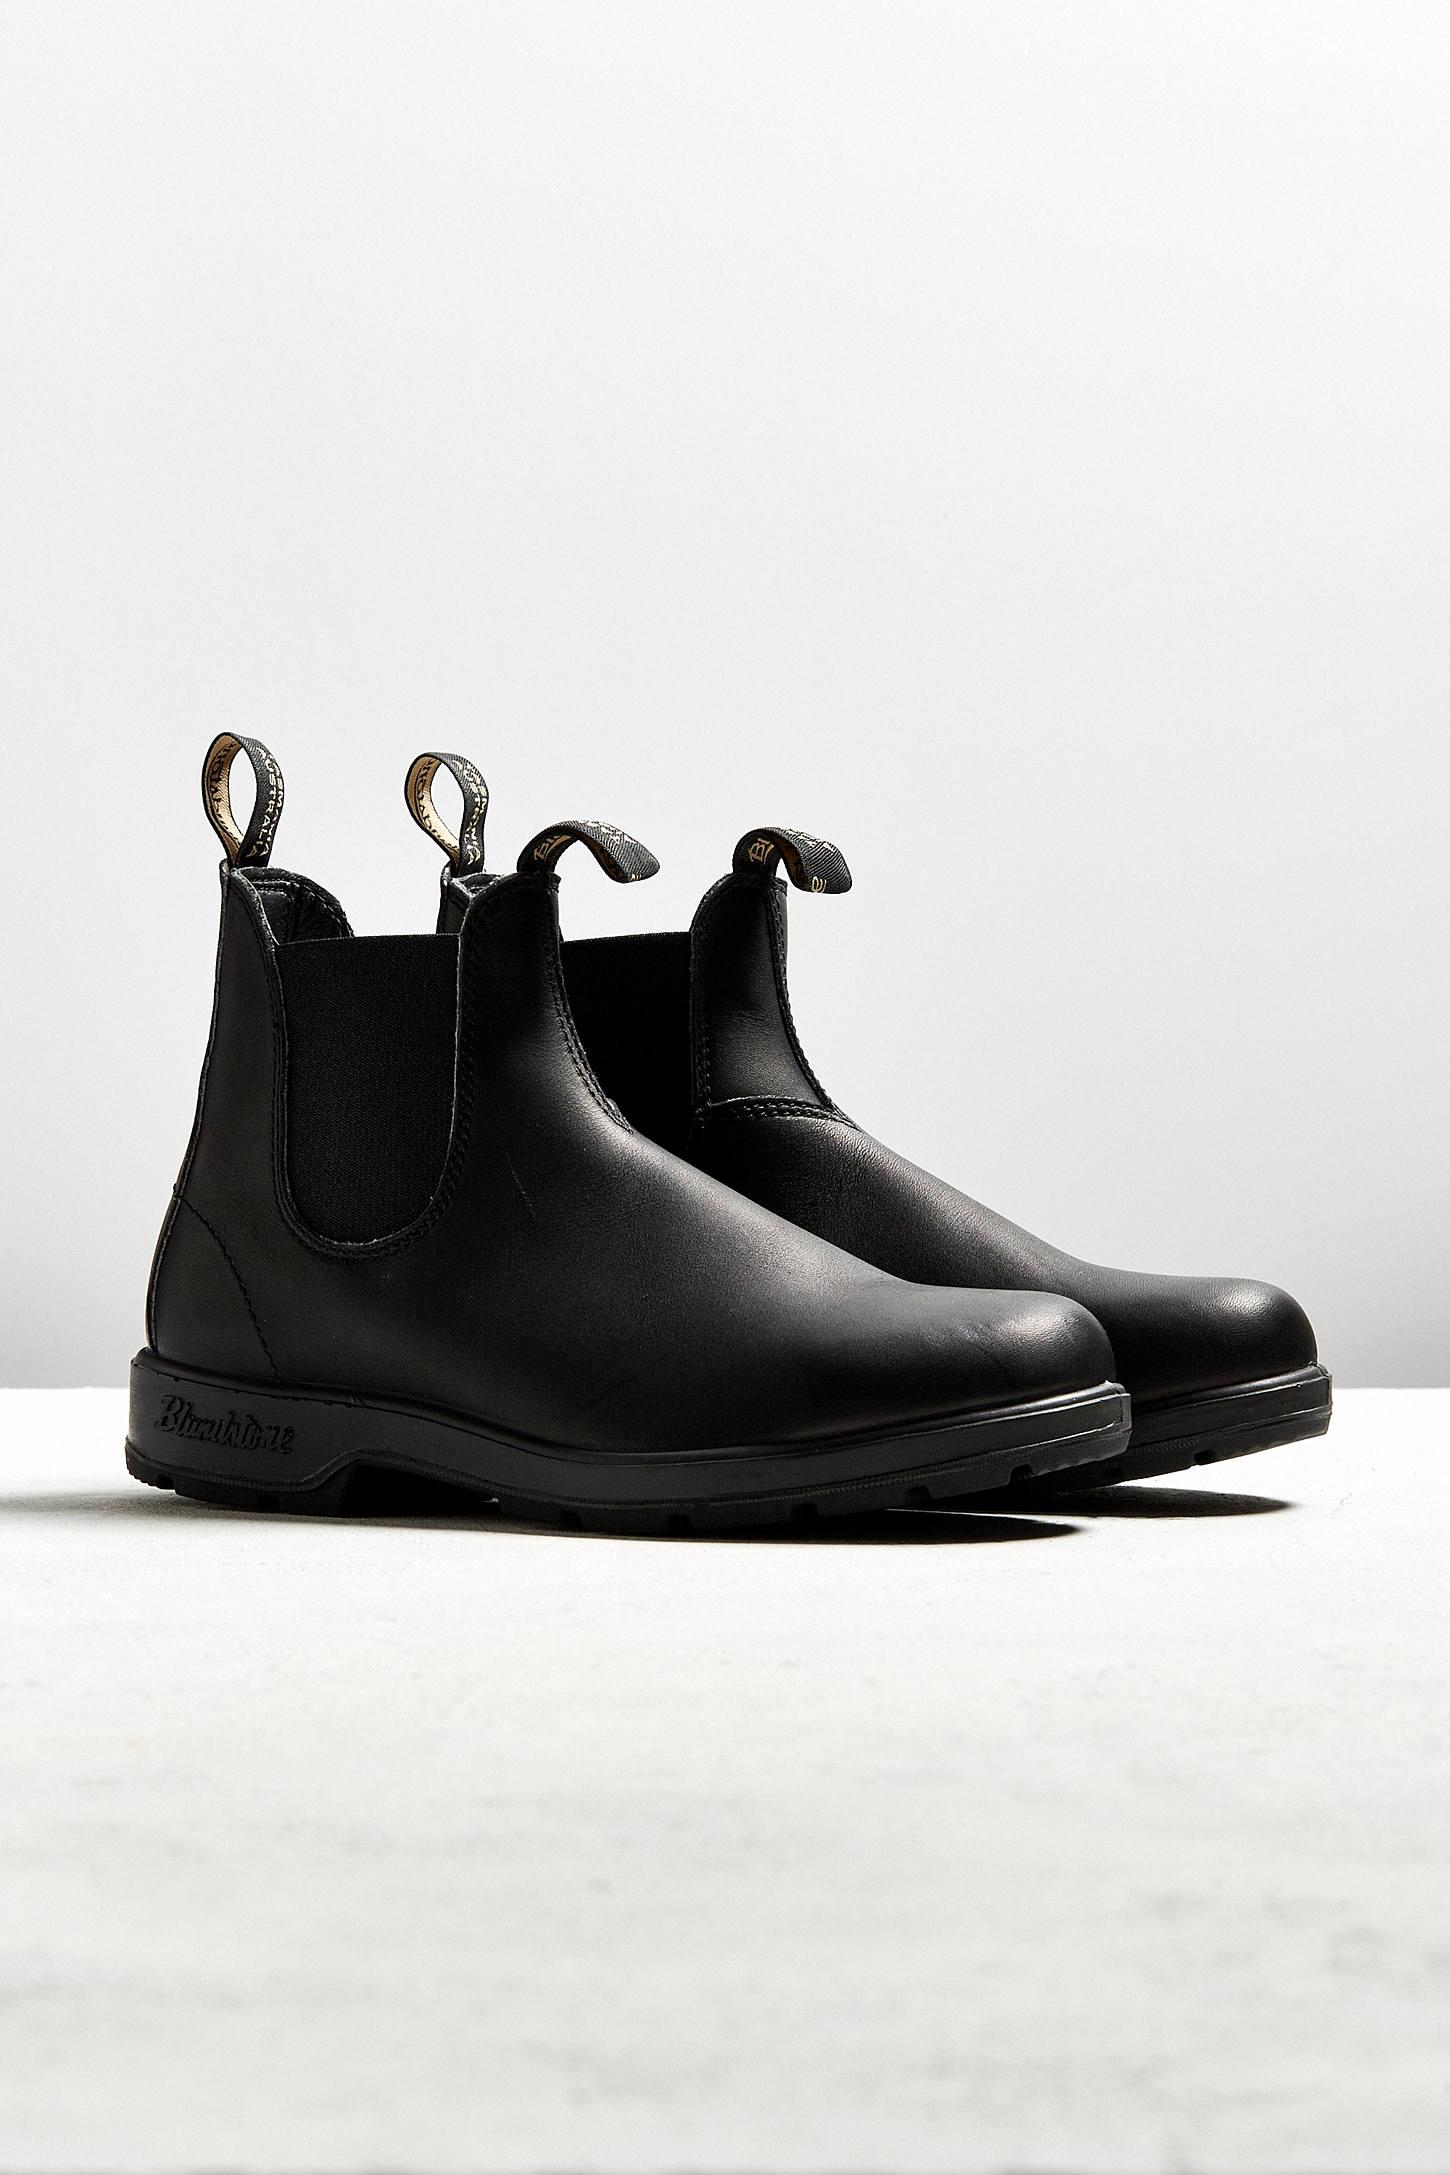 Blundstone Original 510 Boot